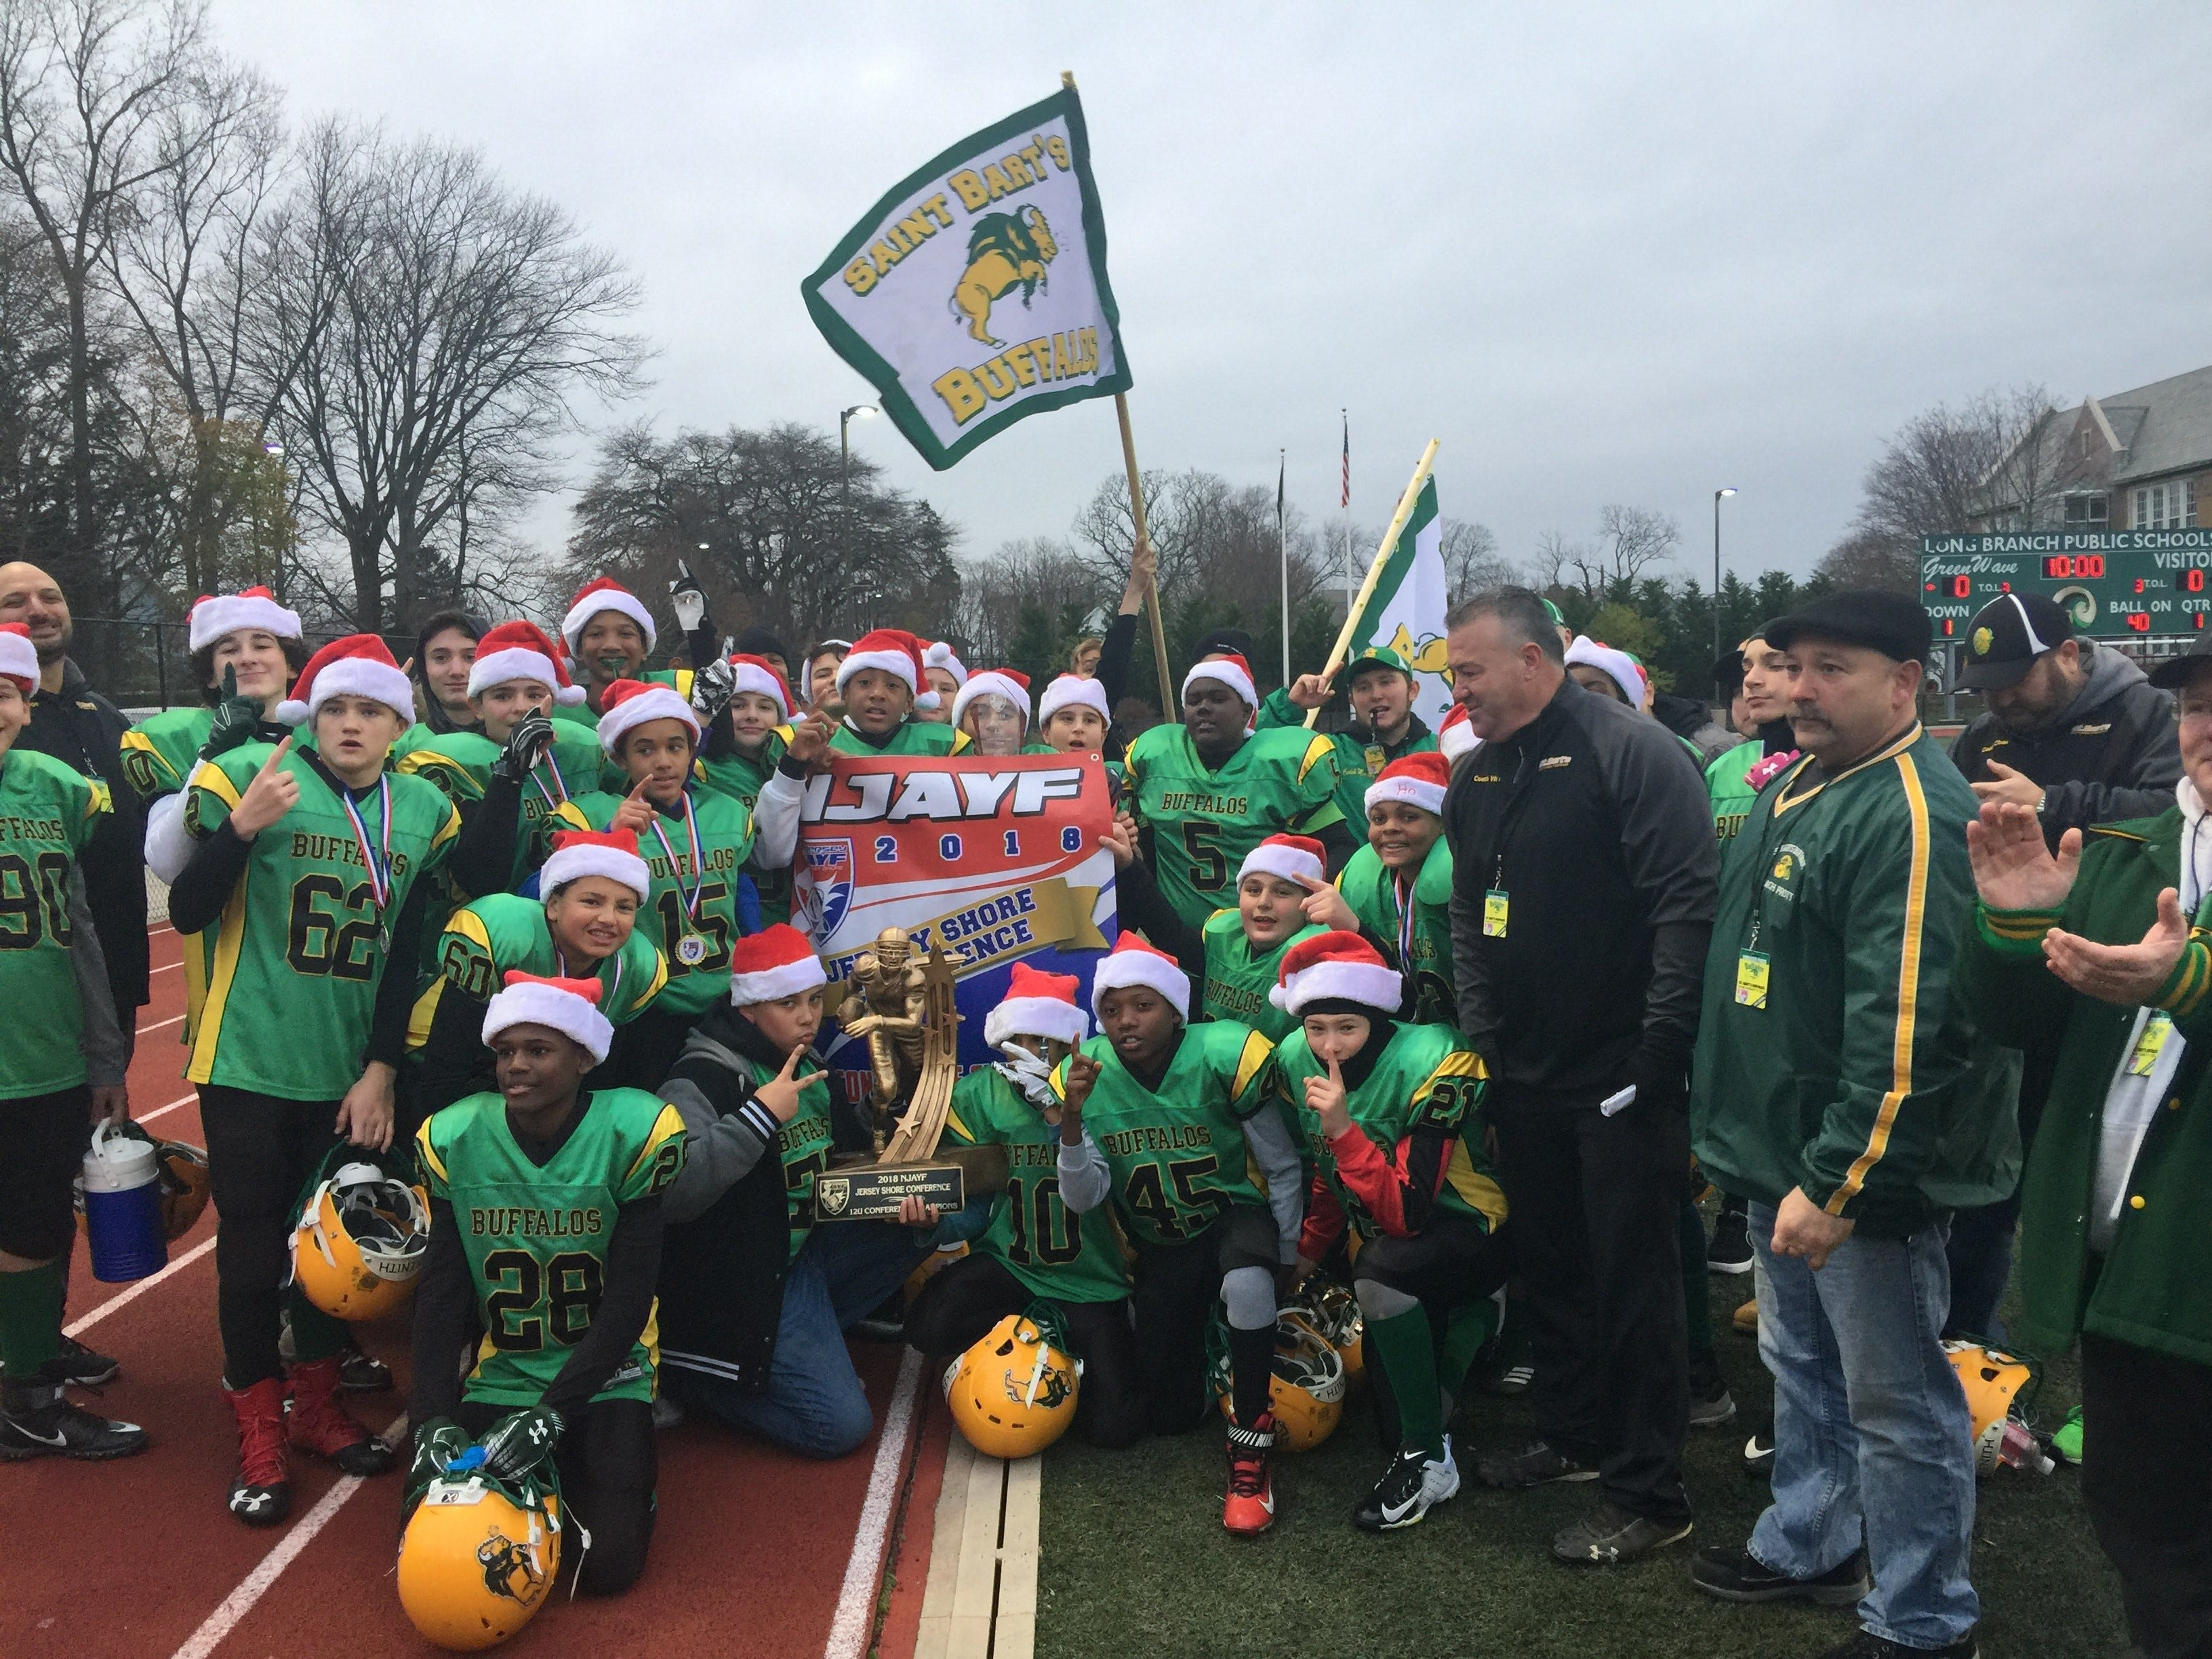 Saint Barts Buffalos Football team is heading to Florida for national championship games.